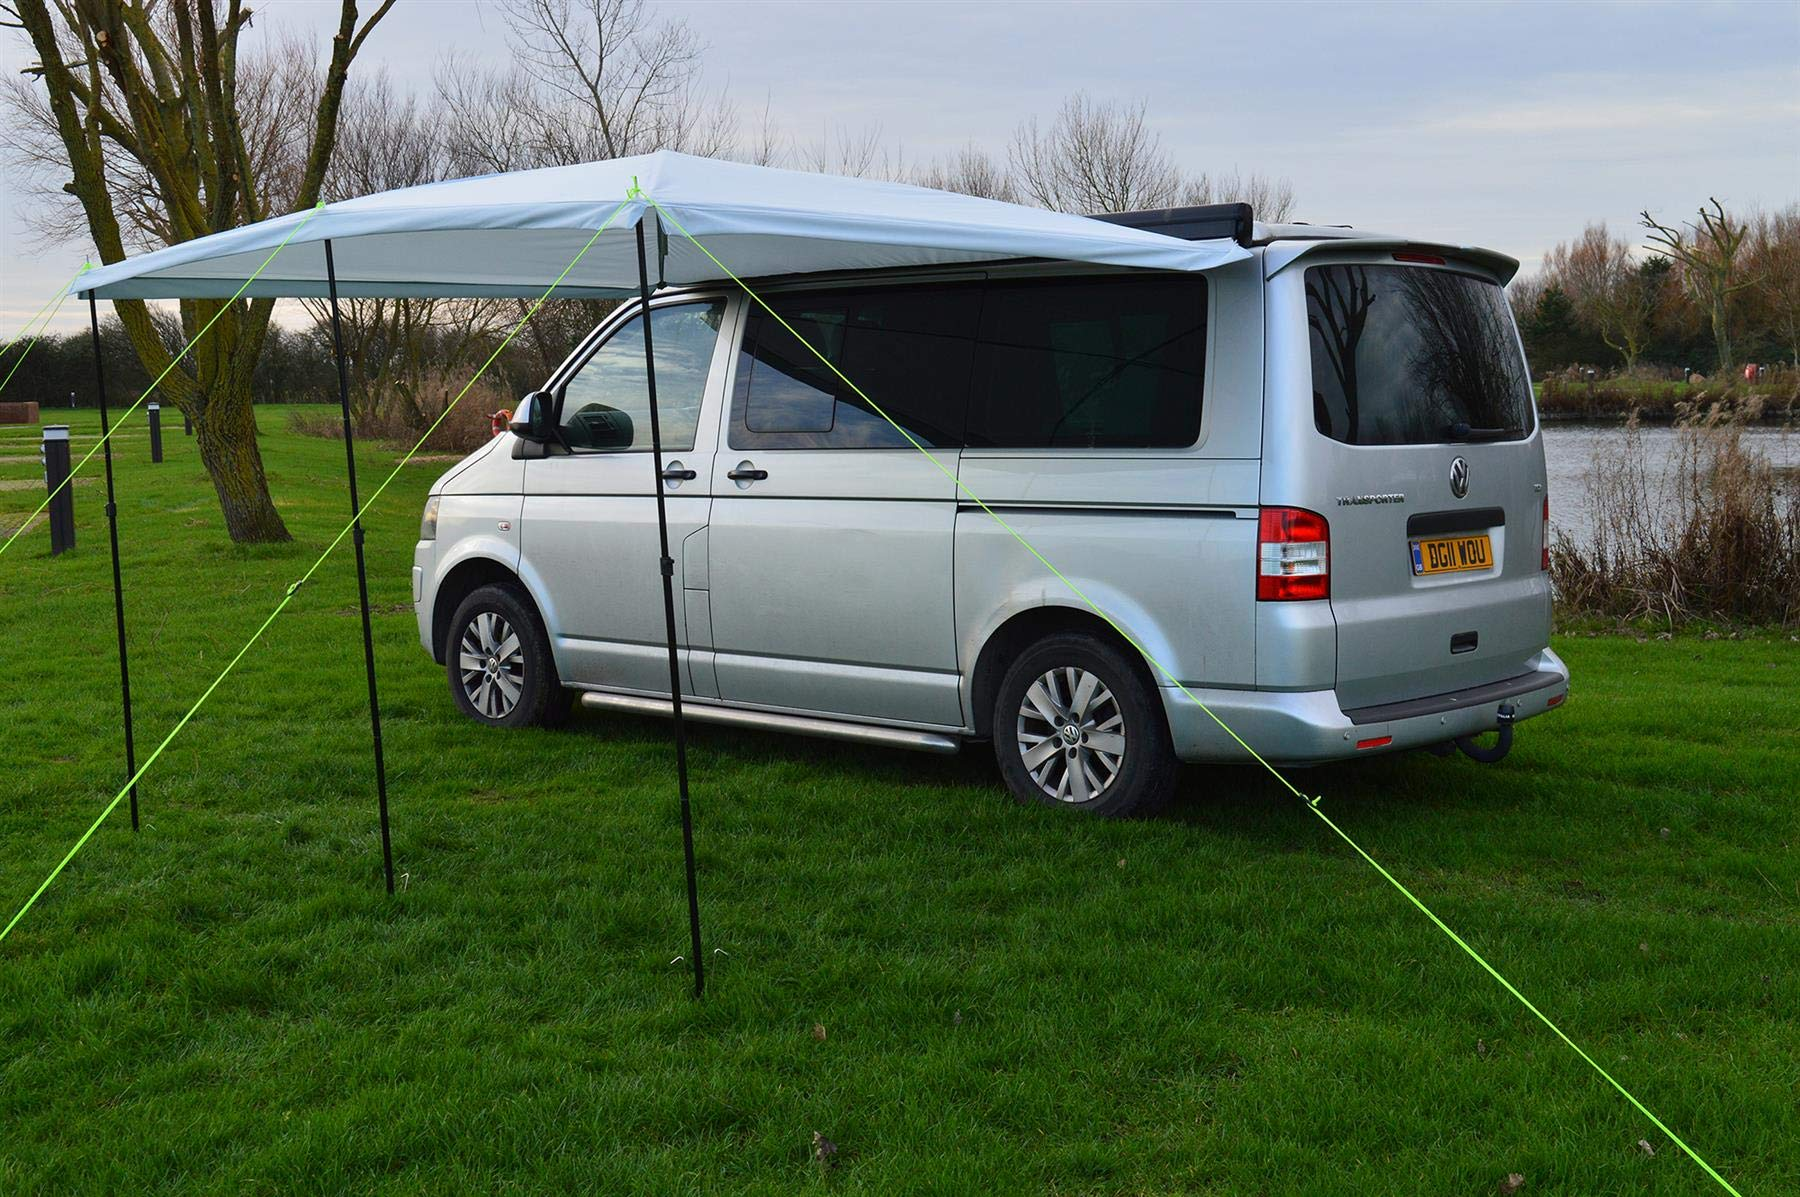 UKB4C Universal Campervan Awning/Sun Canopy Sunshade Motorhome Van 1